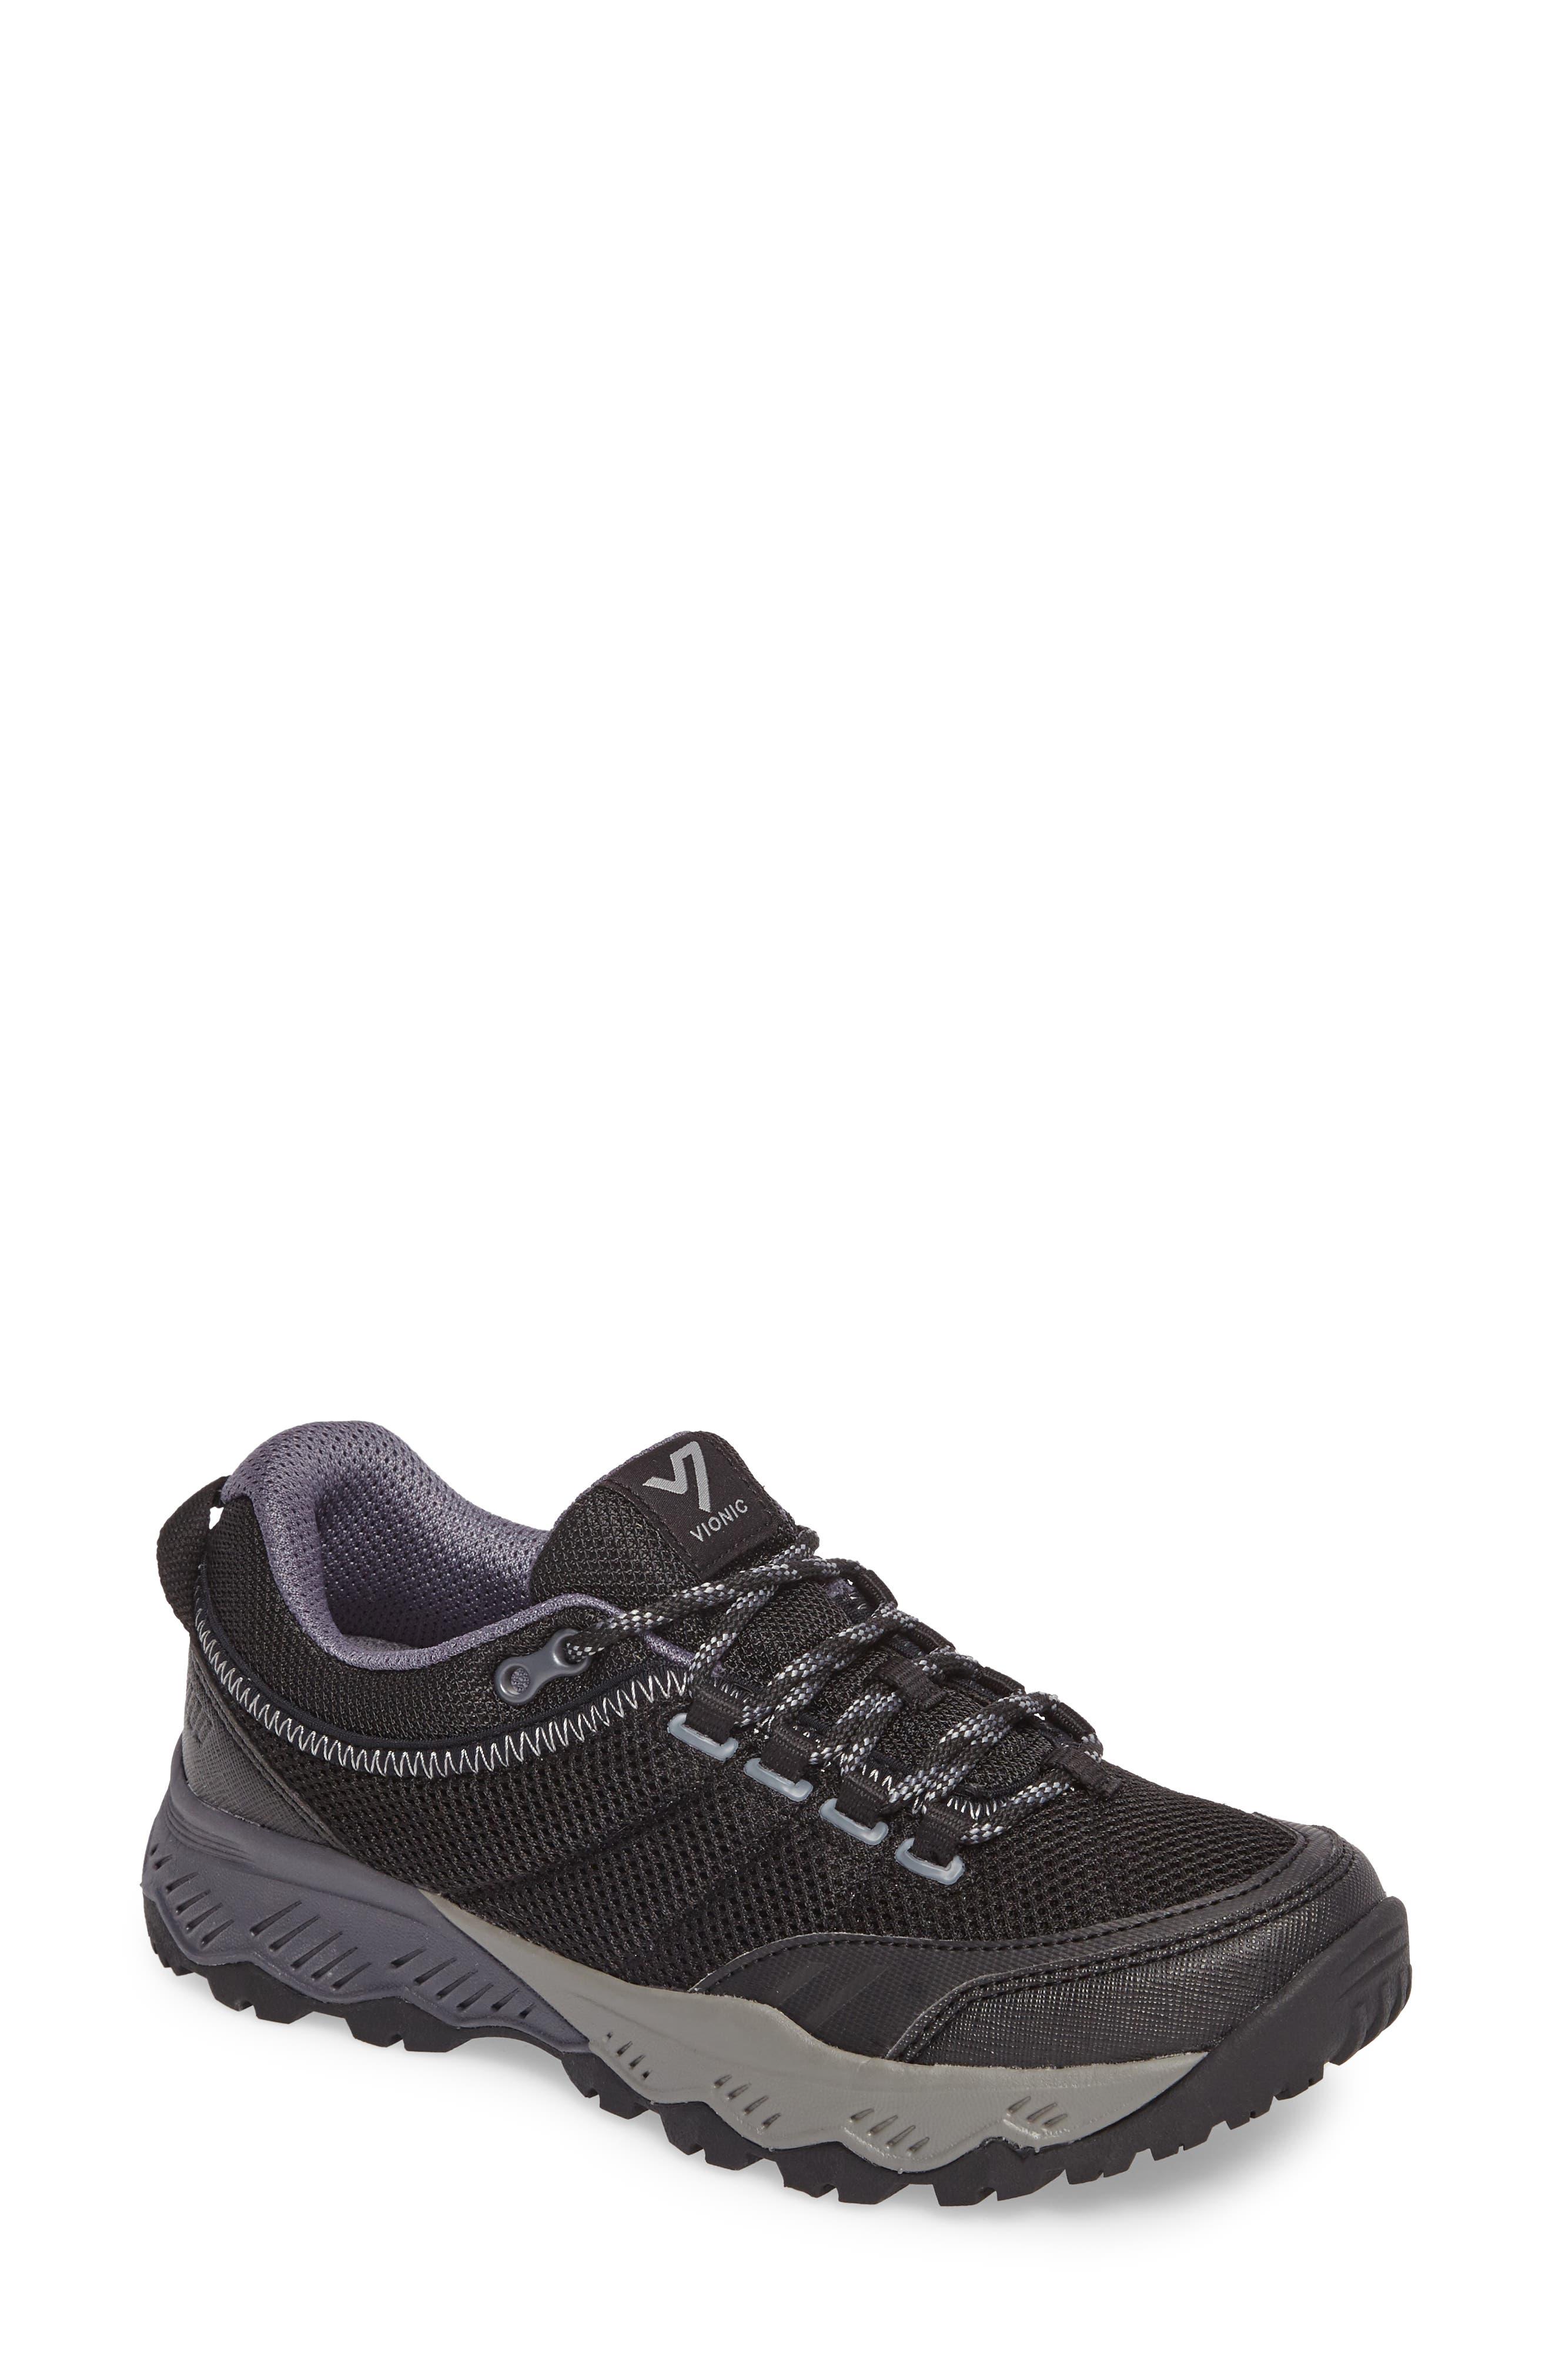 Mckinley Sneaker,                             Main thumbnail 1, color,                             001